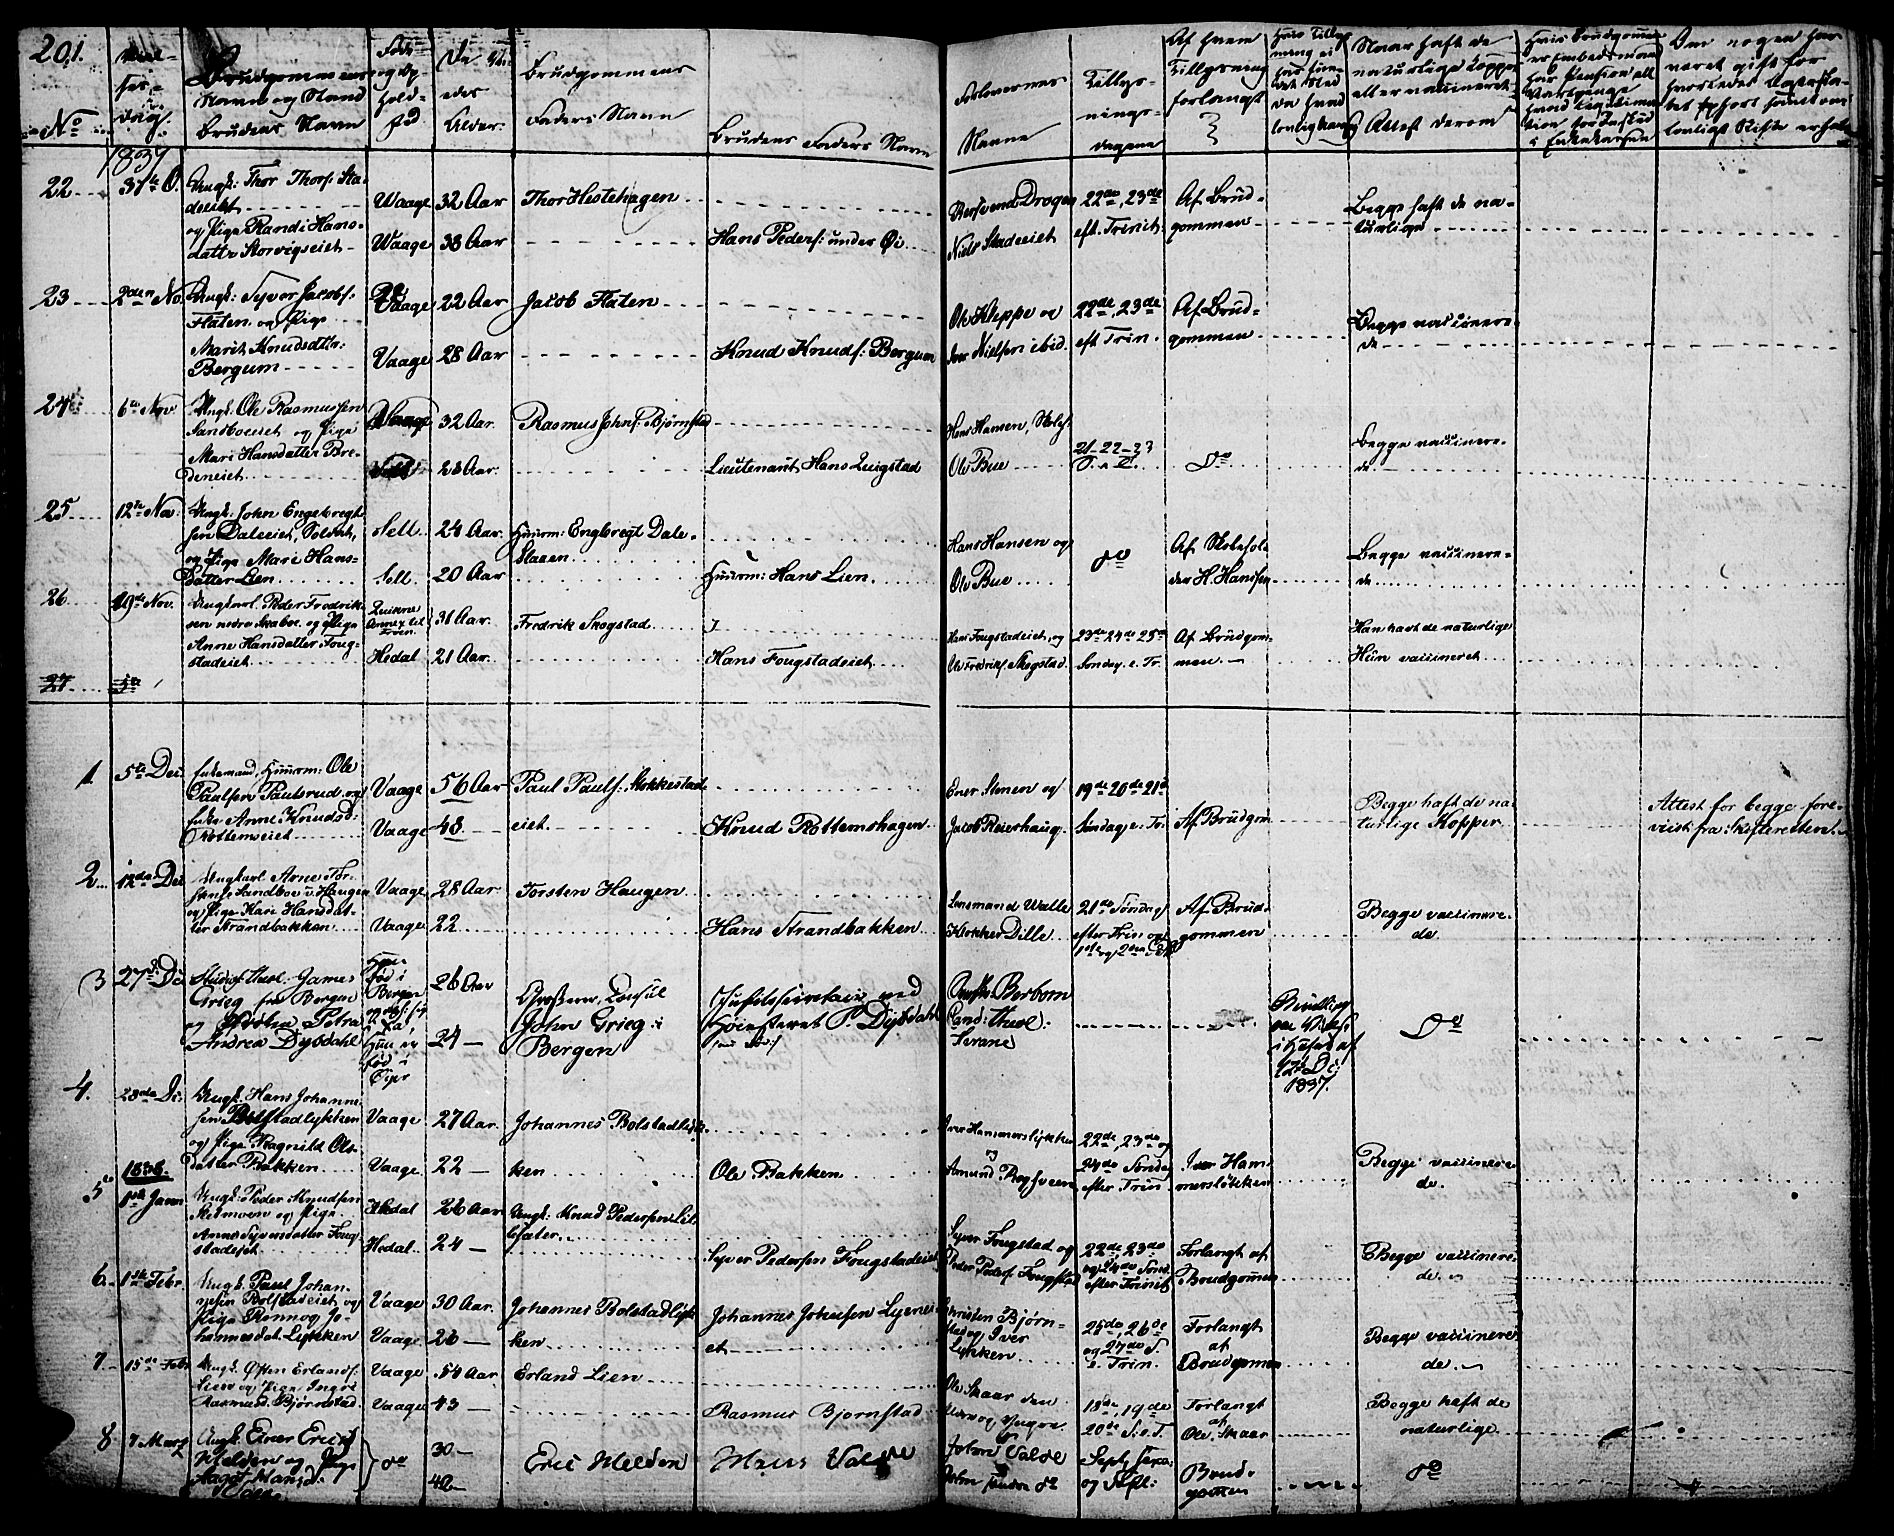 SAH, Vågå prestekontor, Ministerialbok nr. 4 /1, 1827-1842, s. 201